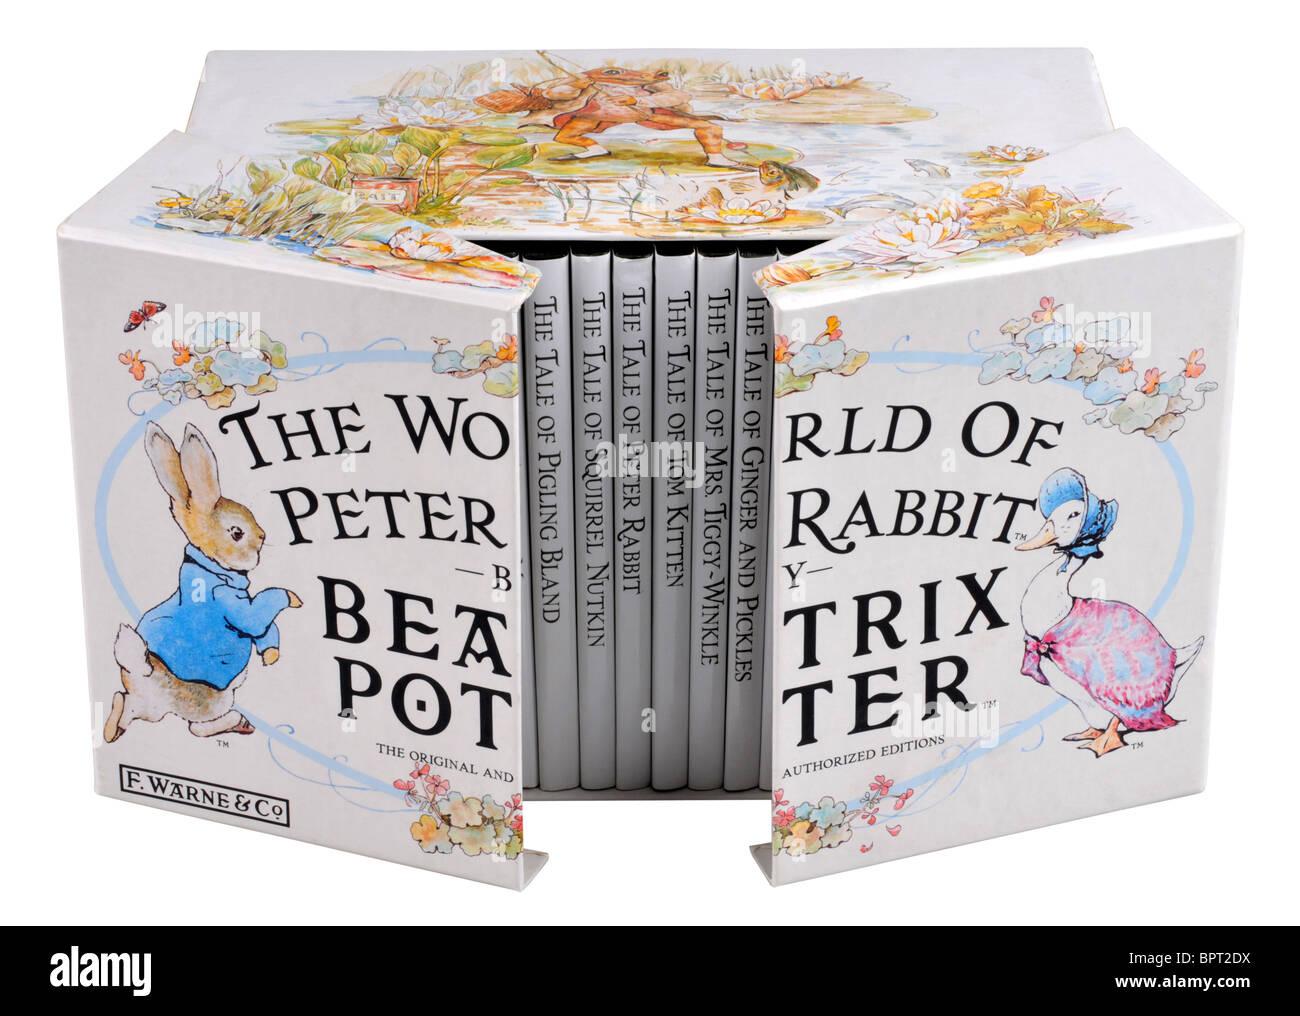 The World of Peter Rabbit box set by Beatrix Potter - Stock Image